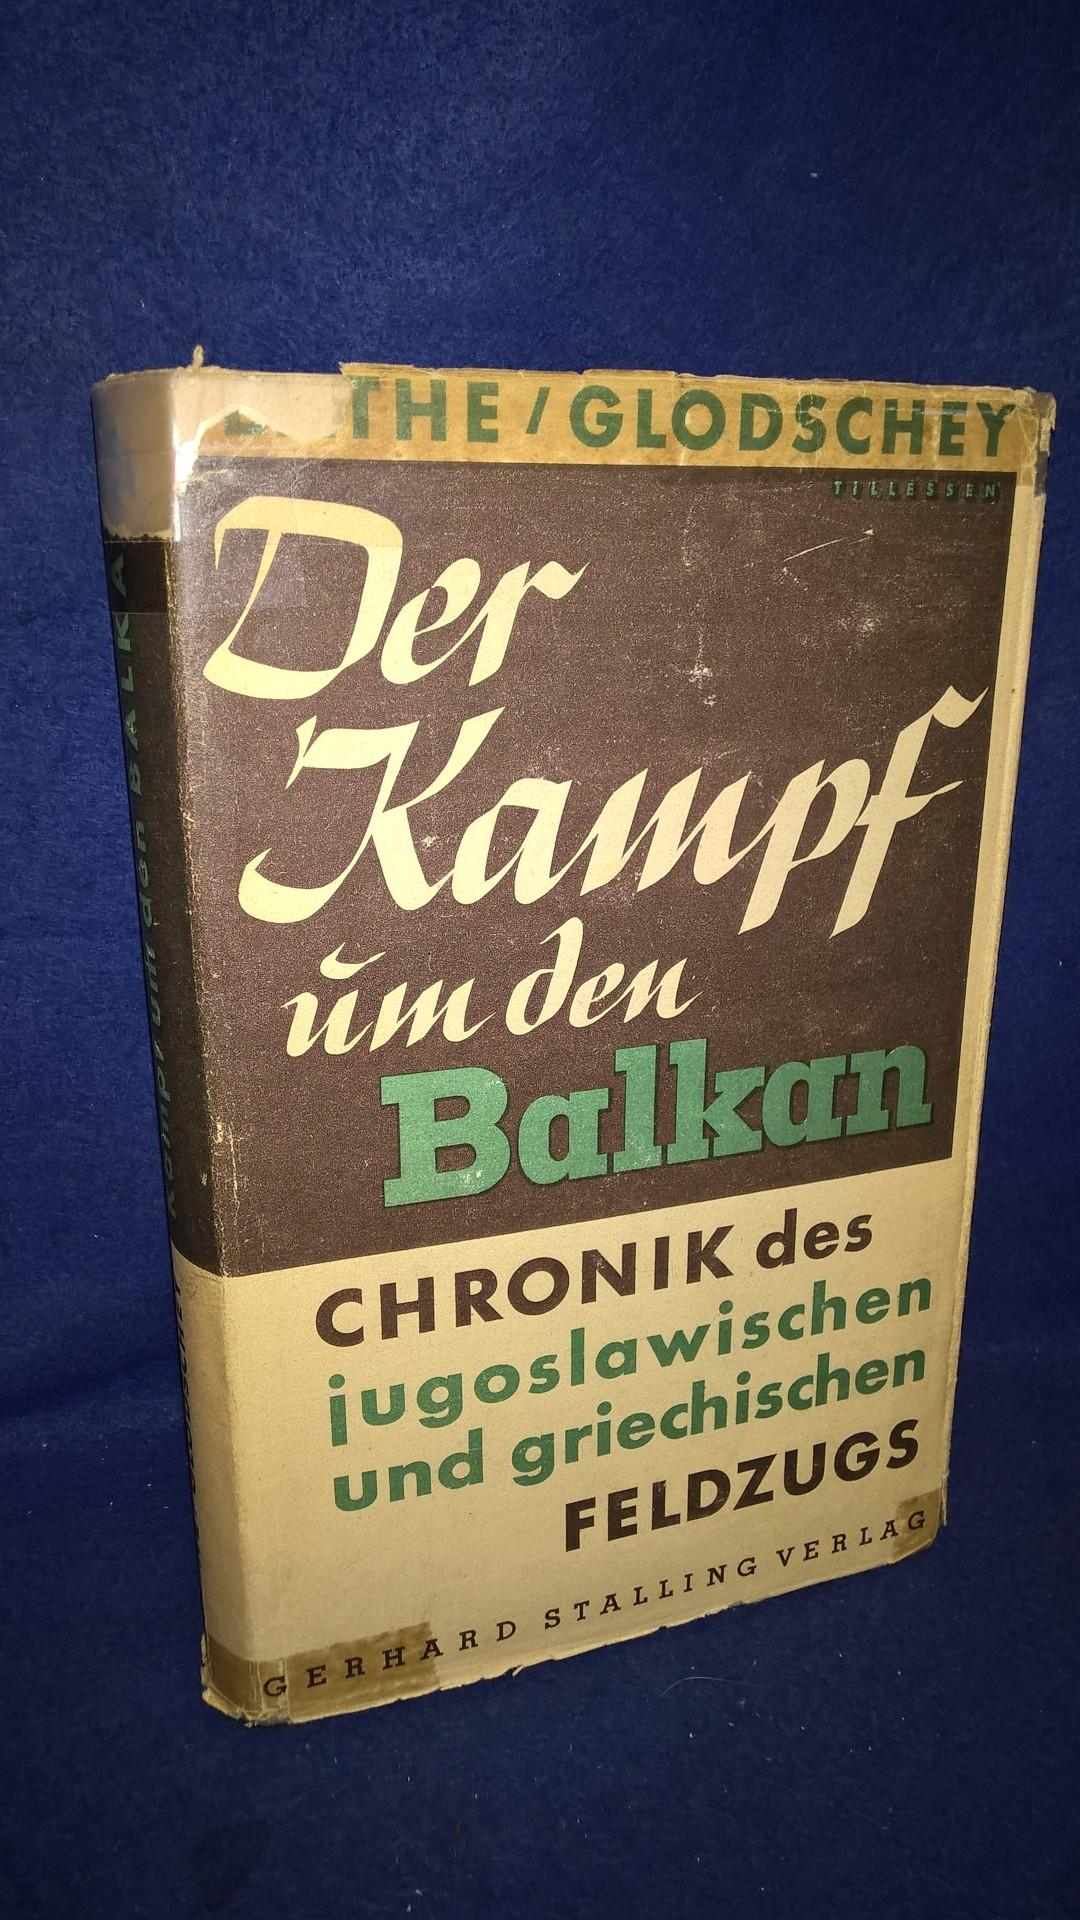 Kampf um den Balkan. Chronik des jugoslawischen und griechischen Feldzugs